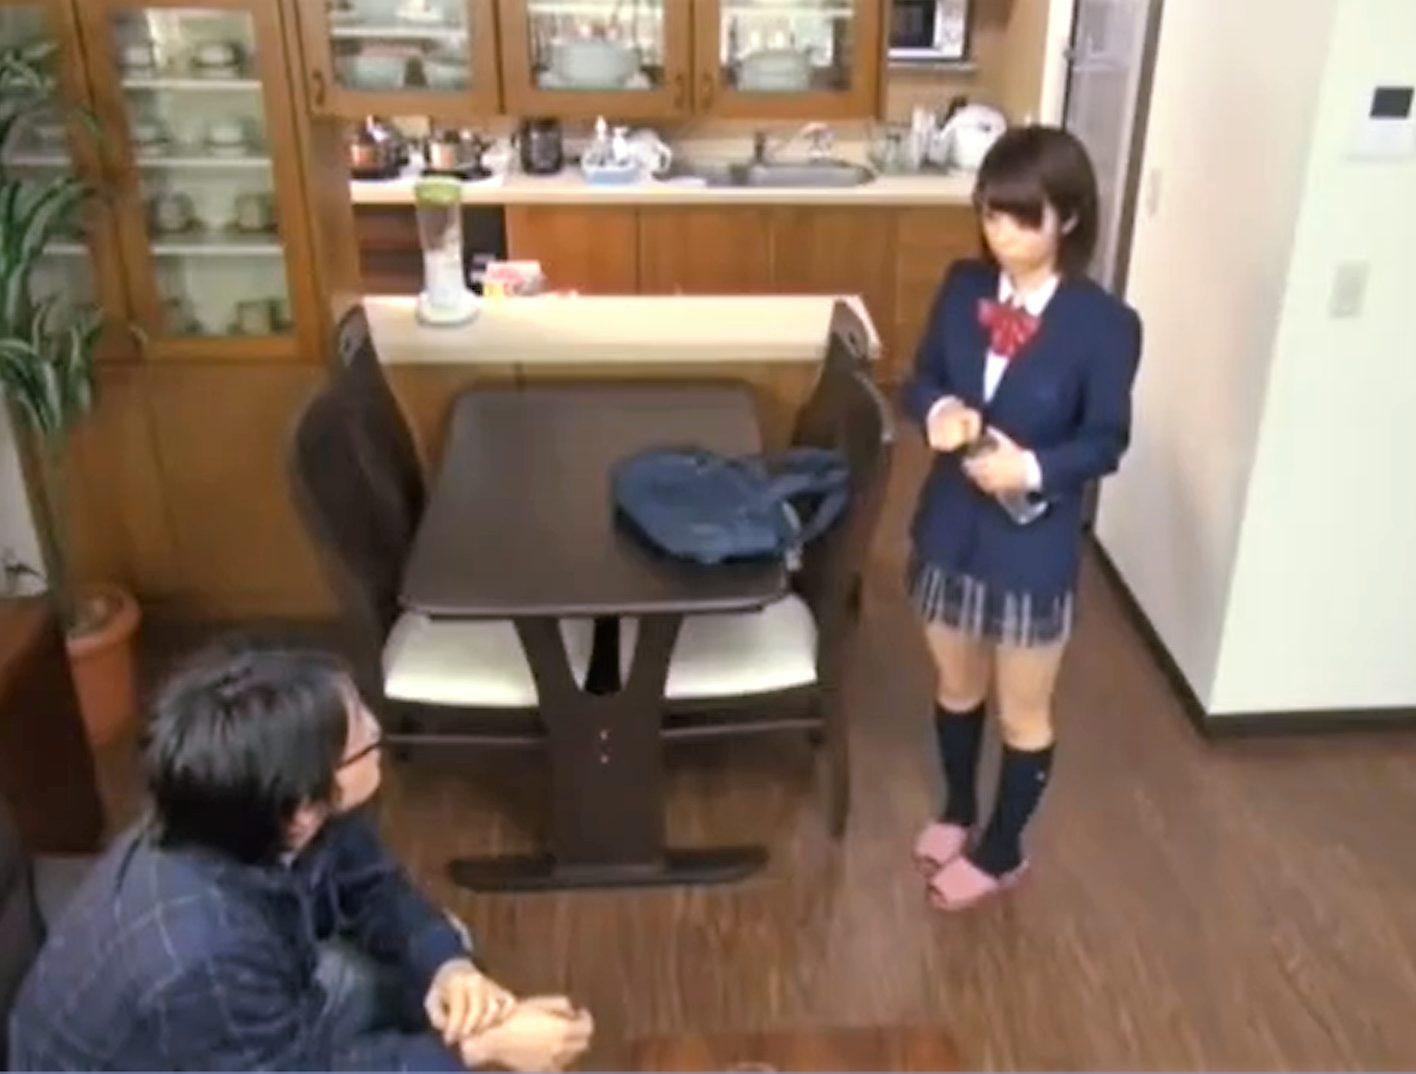 【※JKレイプ※】兄の娘の着替えを覗き襲う!アイドル級の見た目に性欲暴走し犯し尽す…!さくらあき